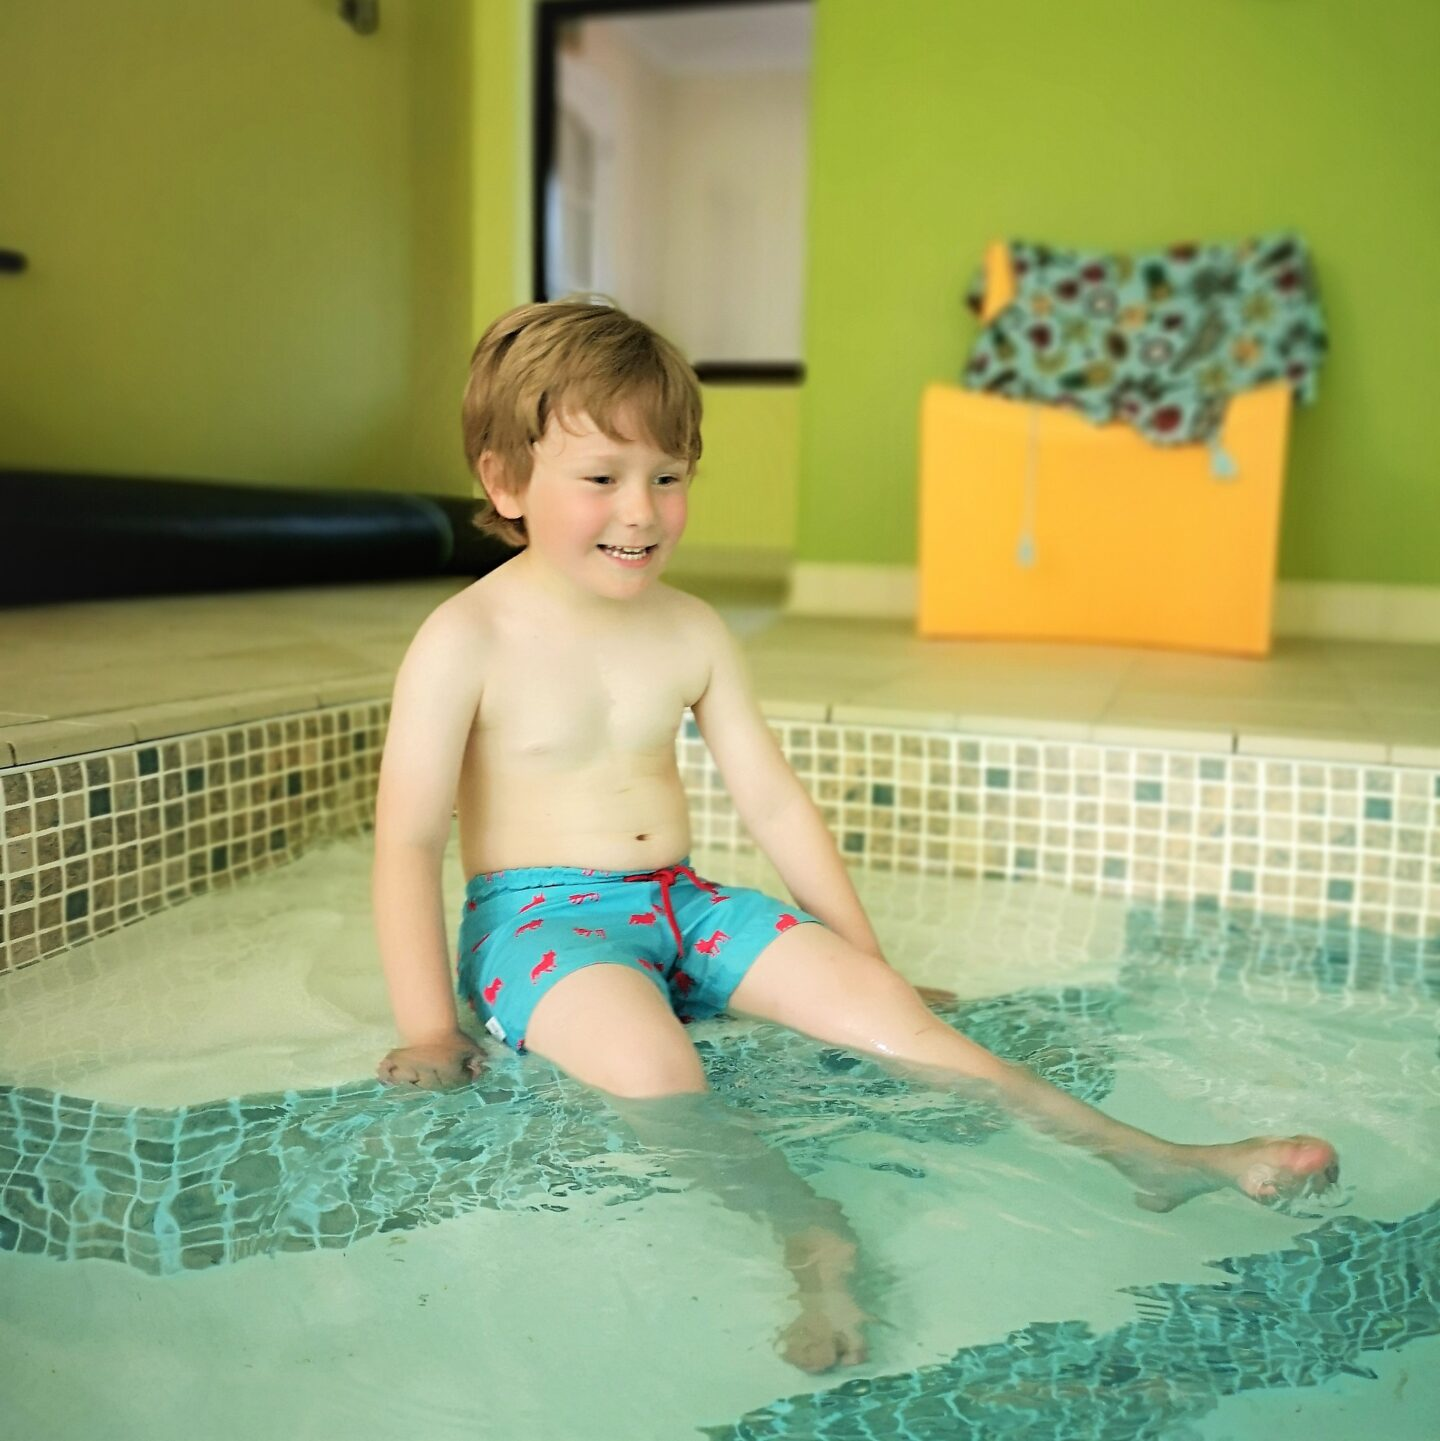 Galago Joe Men's Swim Shorts, Men's & Kids swimwear, Swimwear, Swim Shorts Online, Father's Day Giveaway, Father's Day Ideas, Competition, win, the Frenchie Mummy